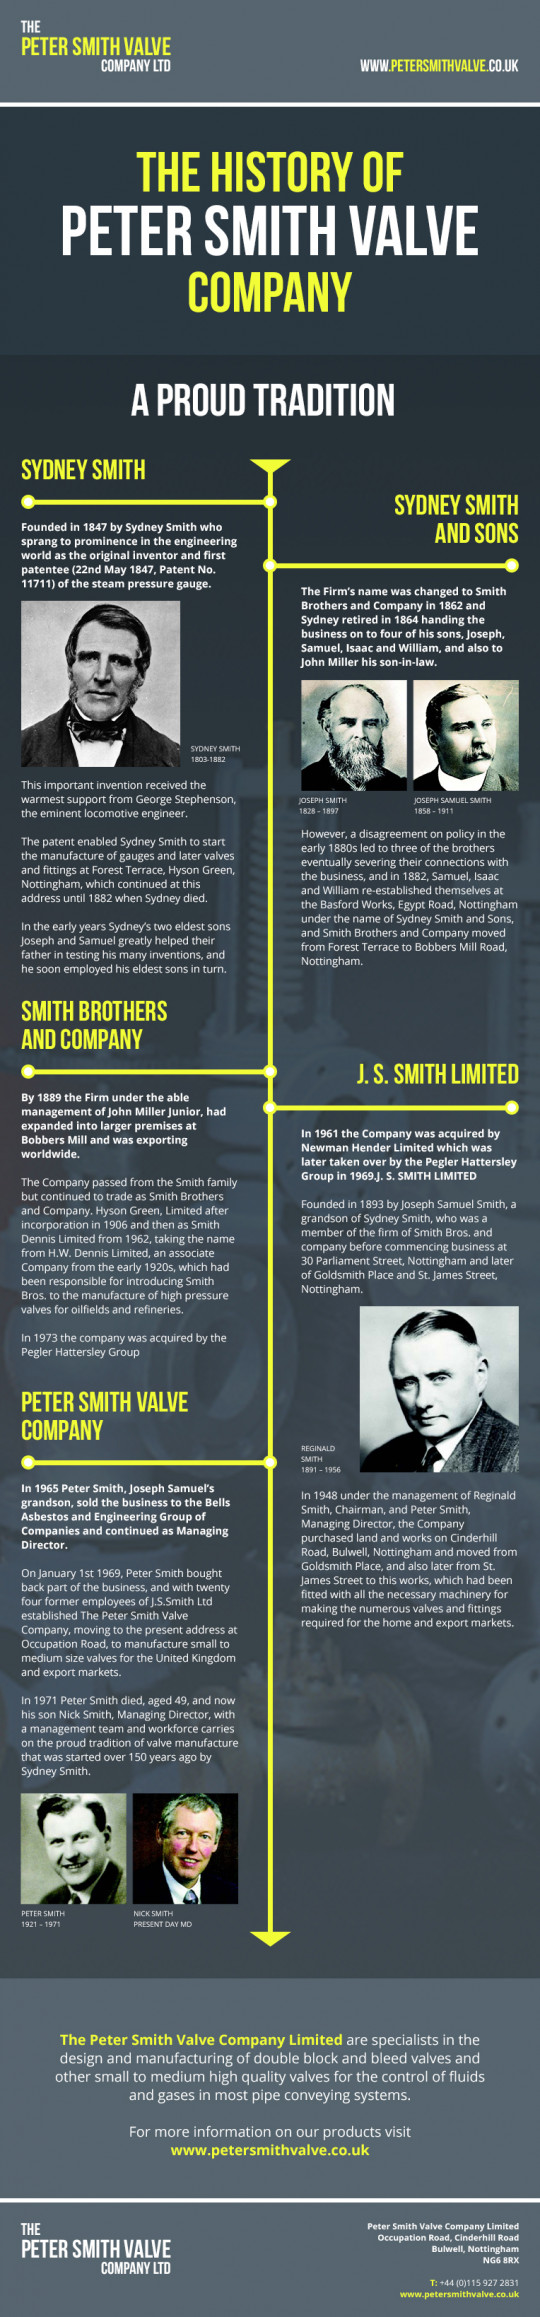 The History of Peter Smith Valve Company